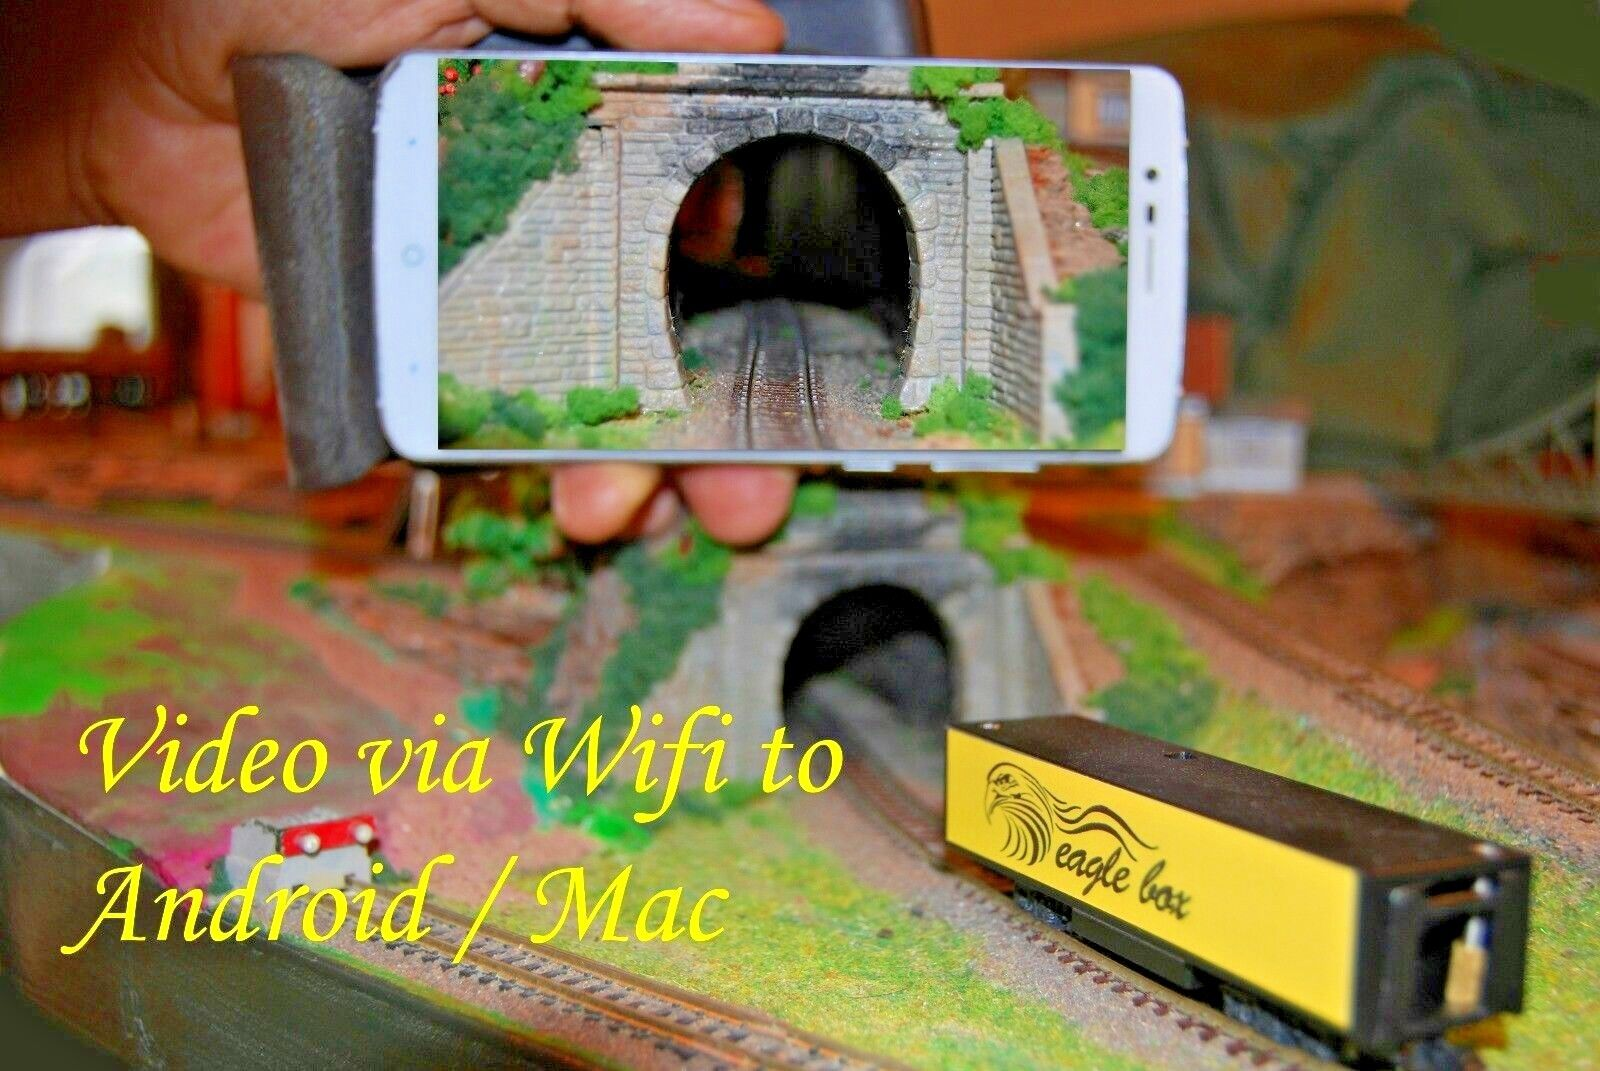 Lok Digital  Kamera Wagen N  Eagle Box Wlan Wifi Android Mac